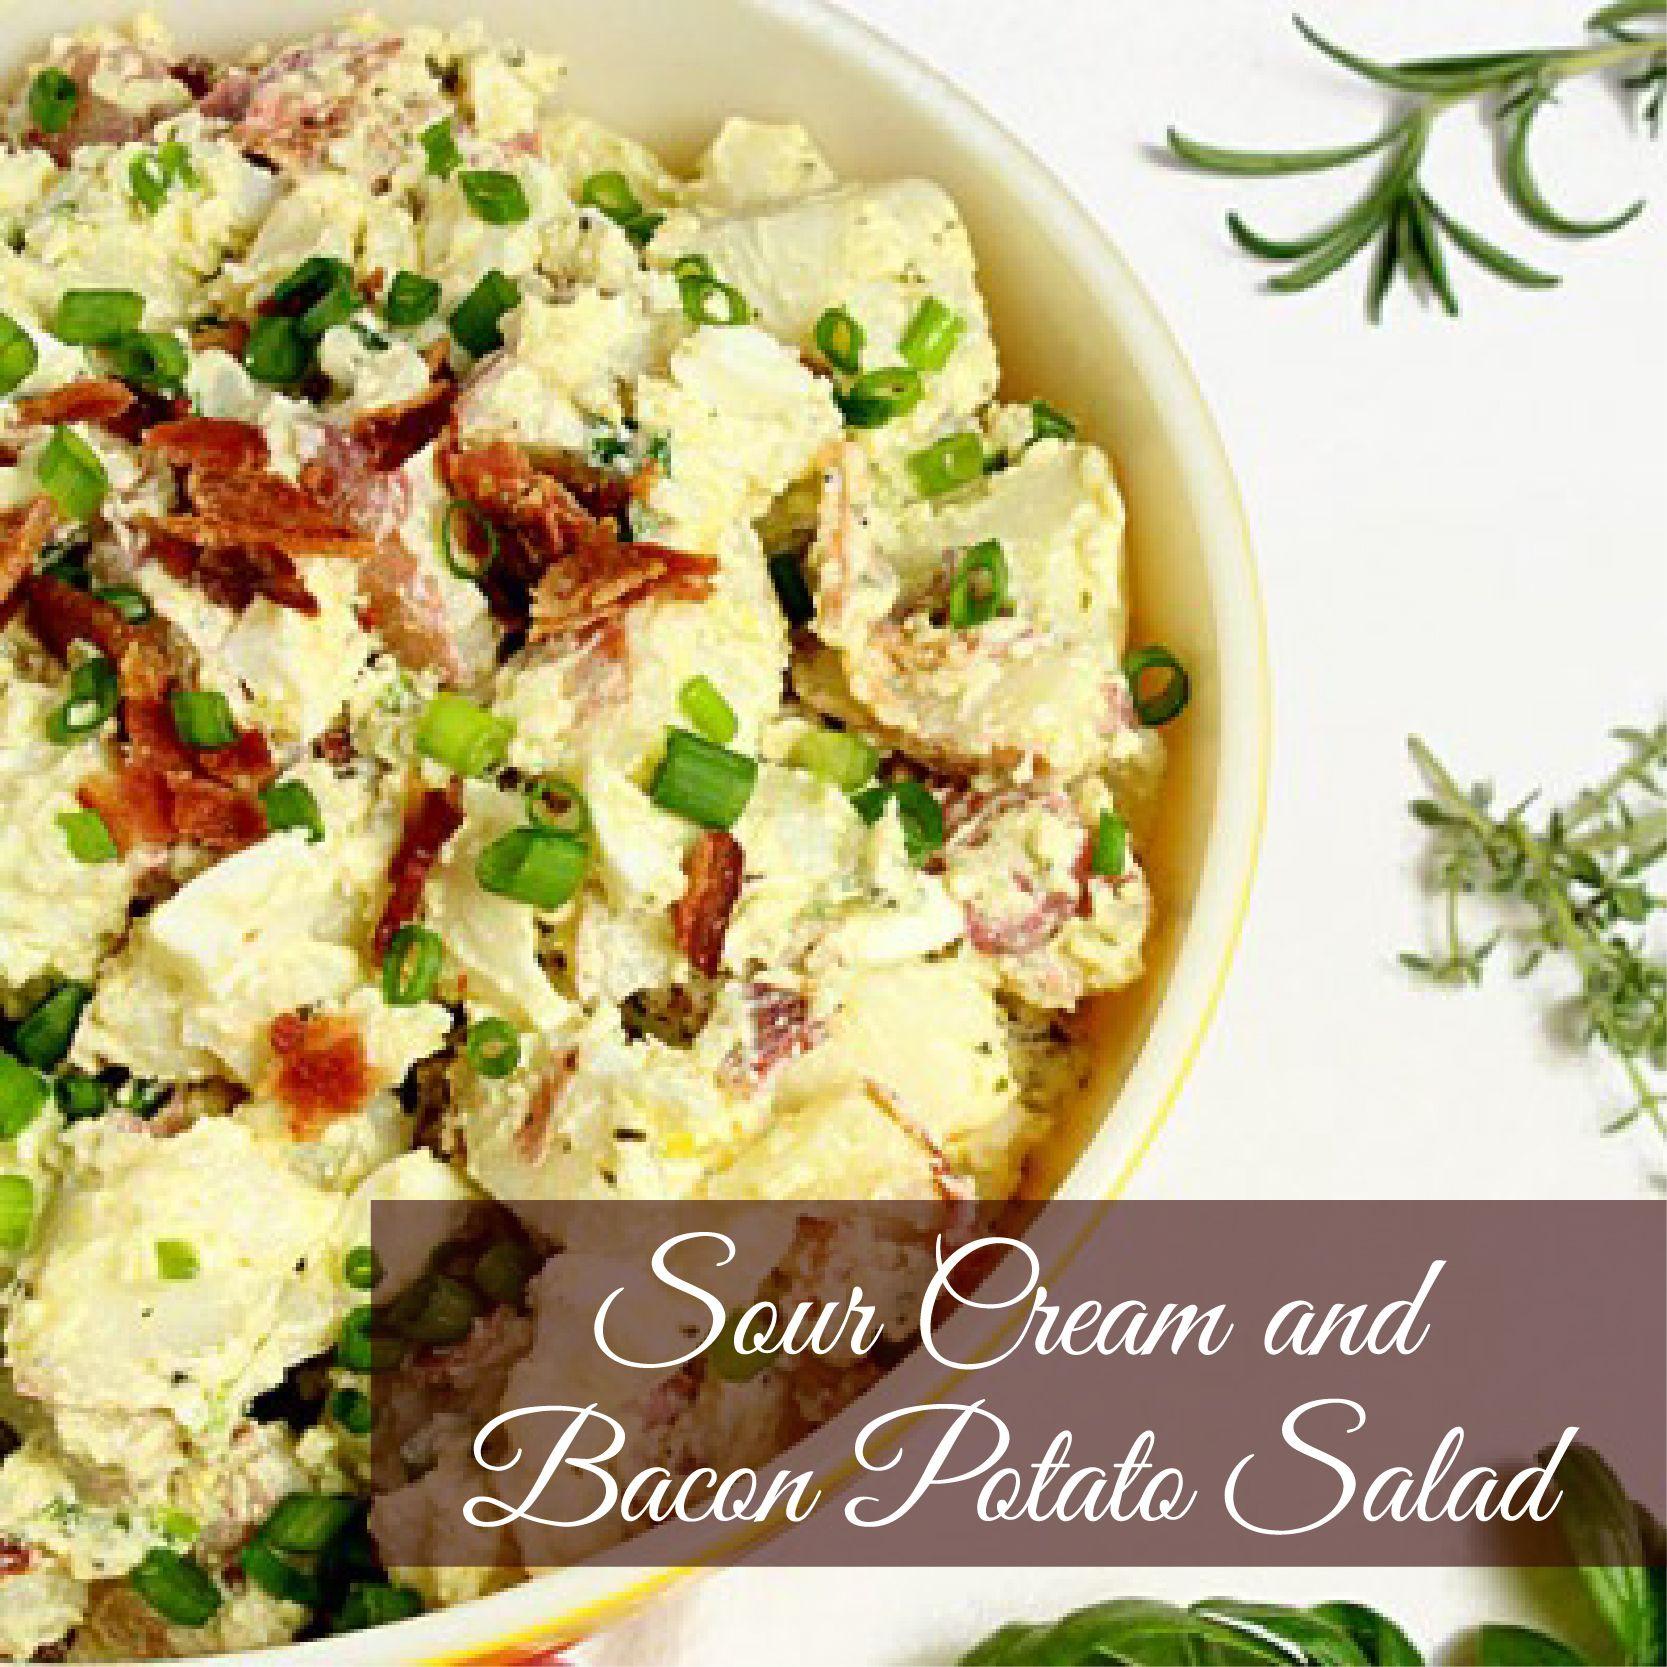 Sour Cream And Bacon Potato Salad Potatoe Salad Recipe Bacon Potato Salad Potato Salad